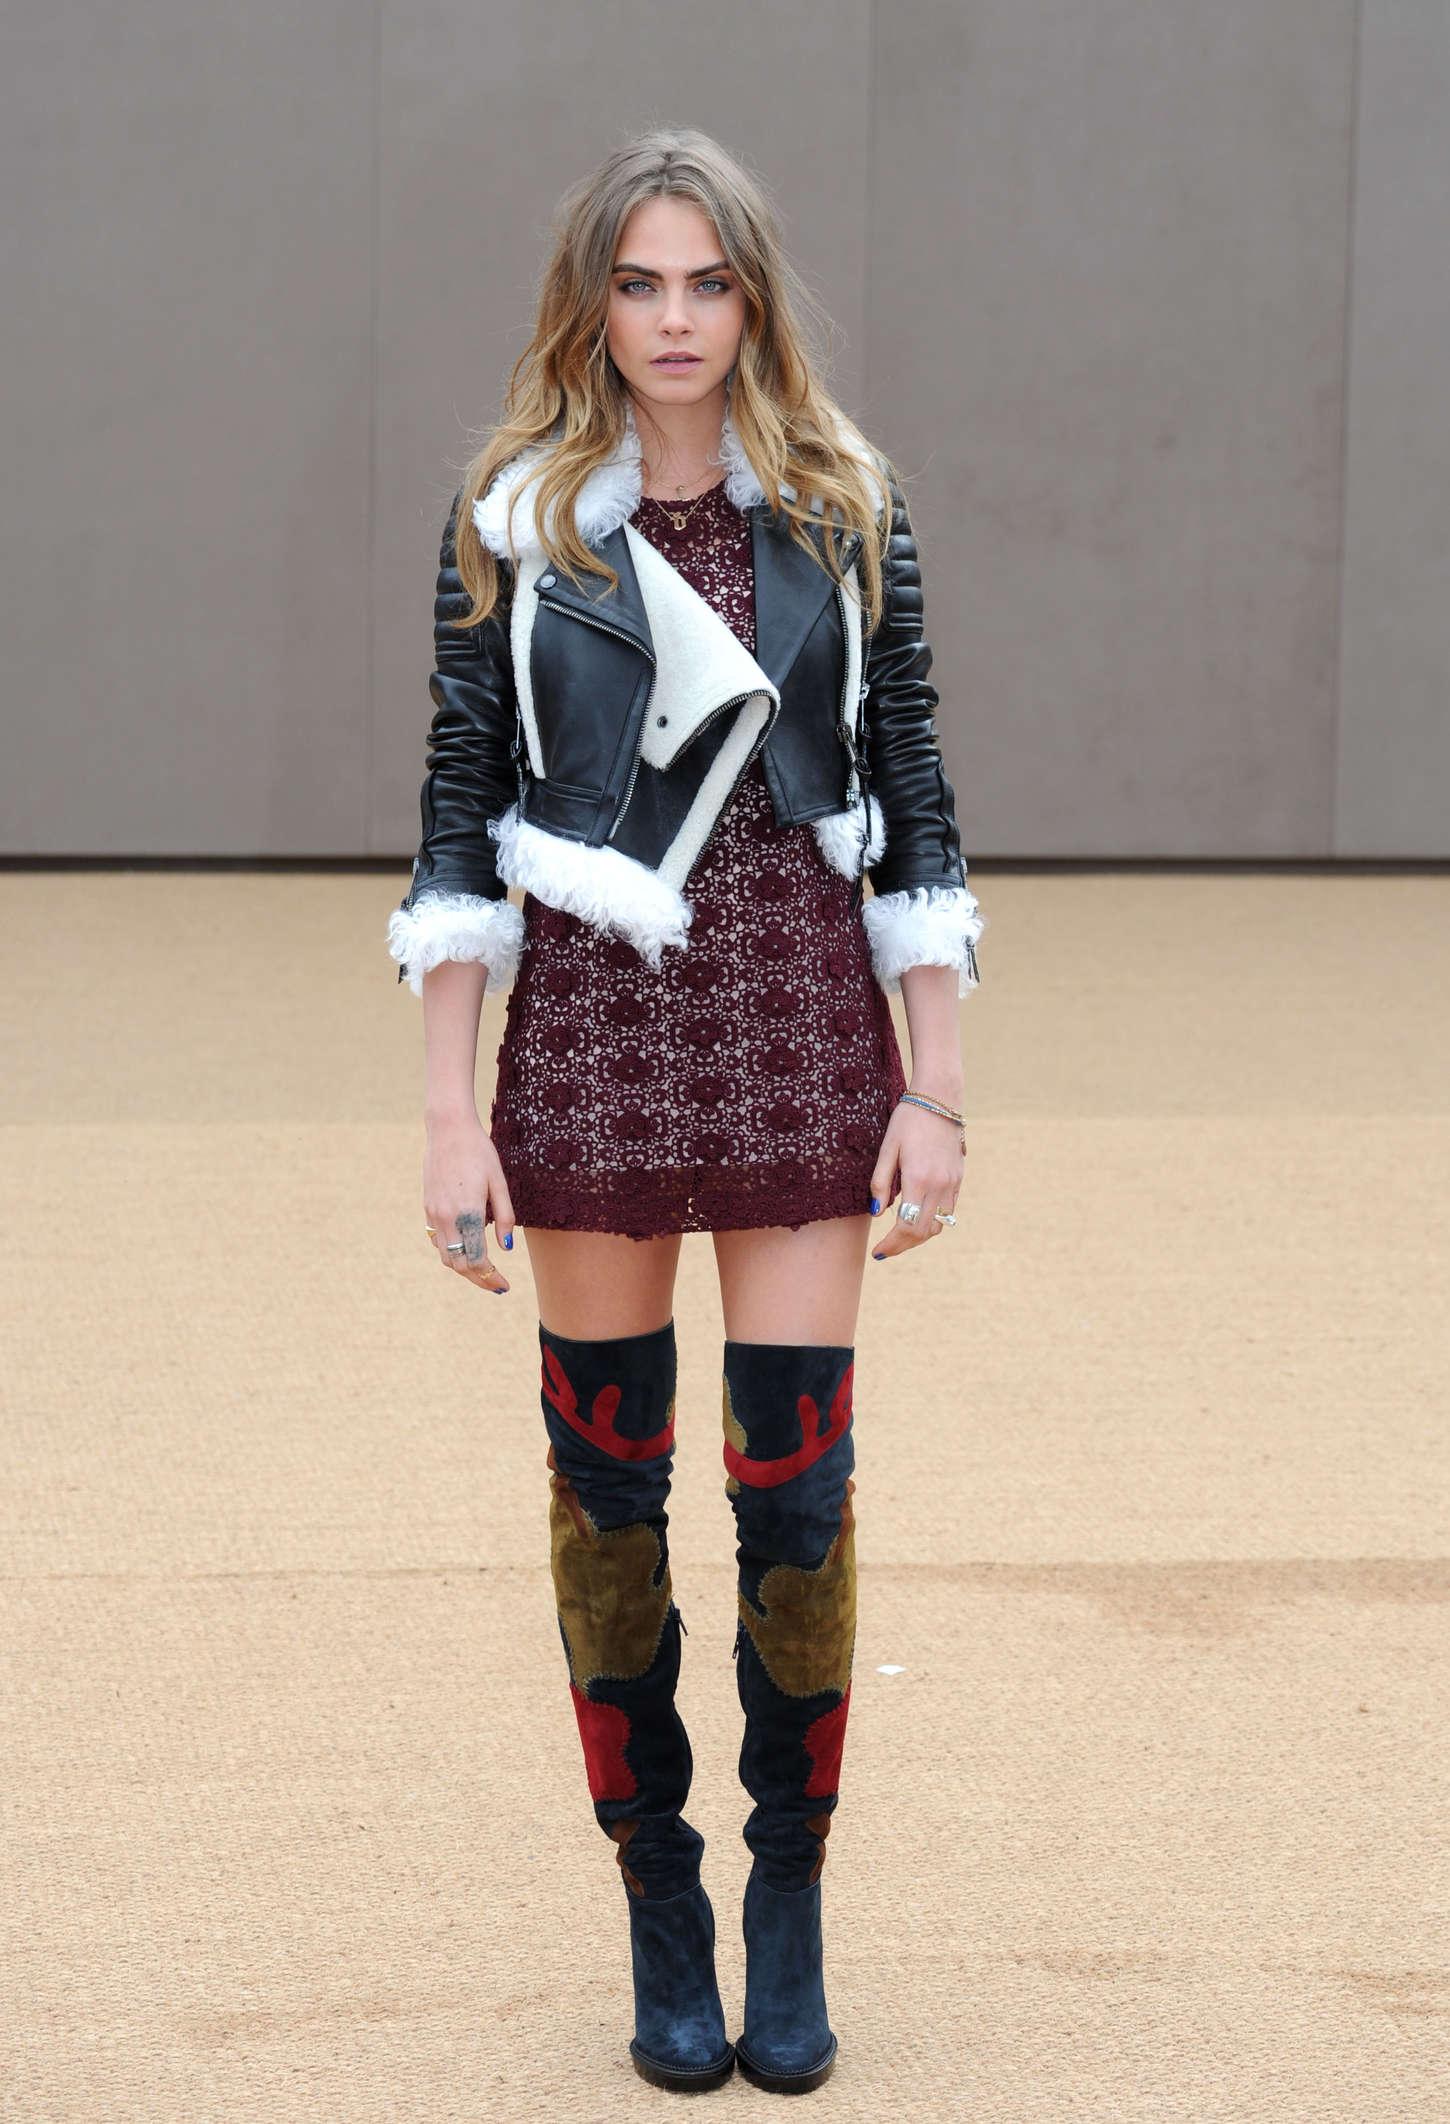 ... gallery Cara Delevingne – Burberry Prorsum Fashion Show in London